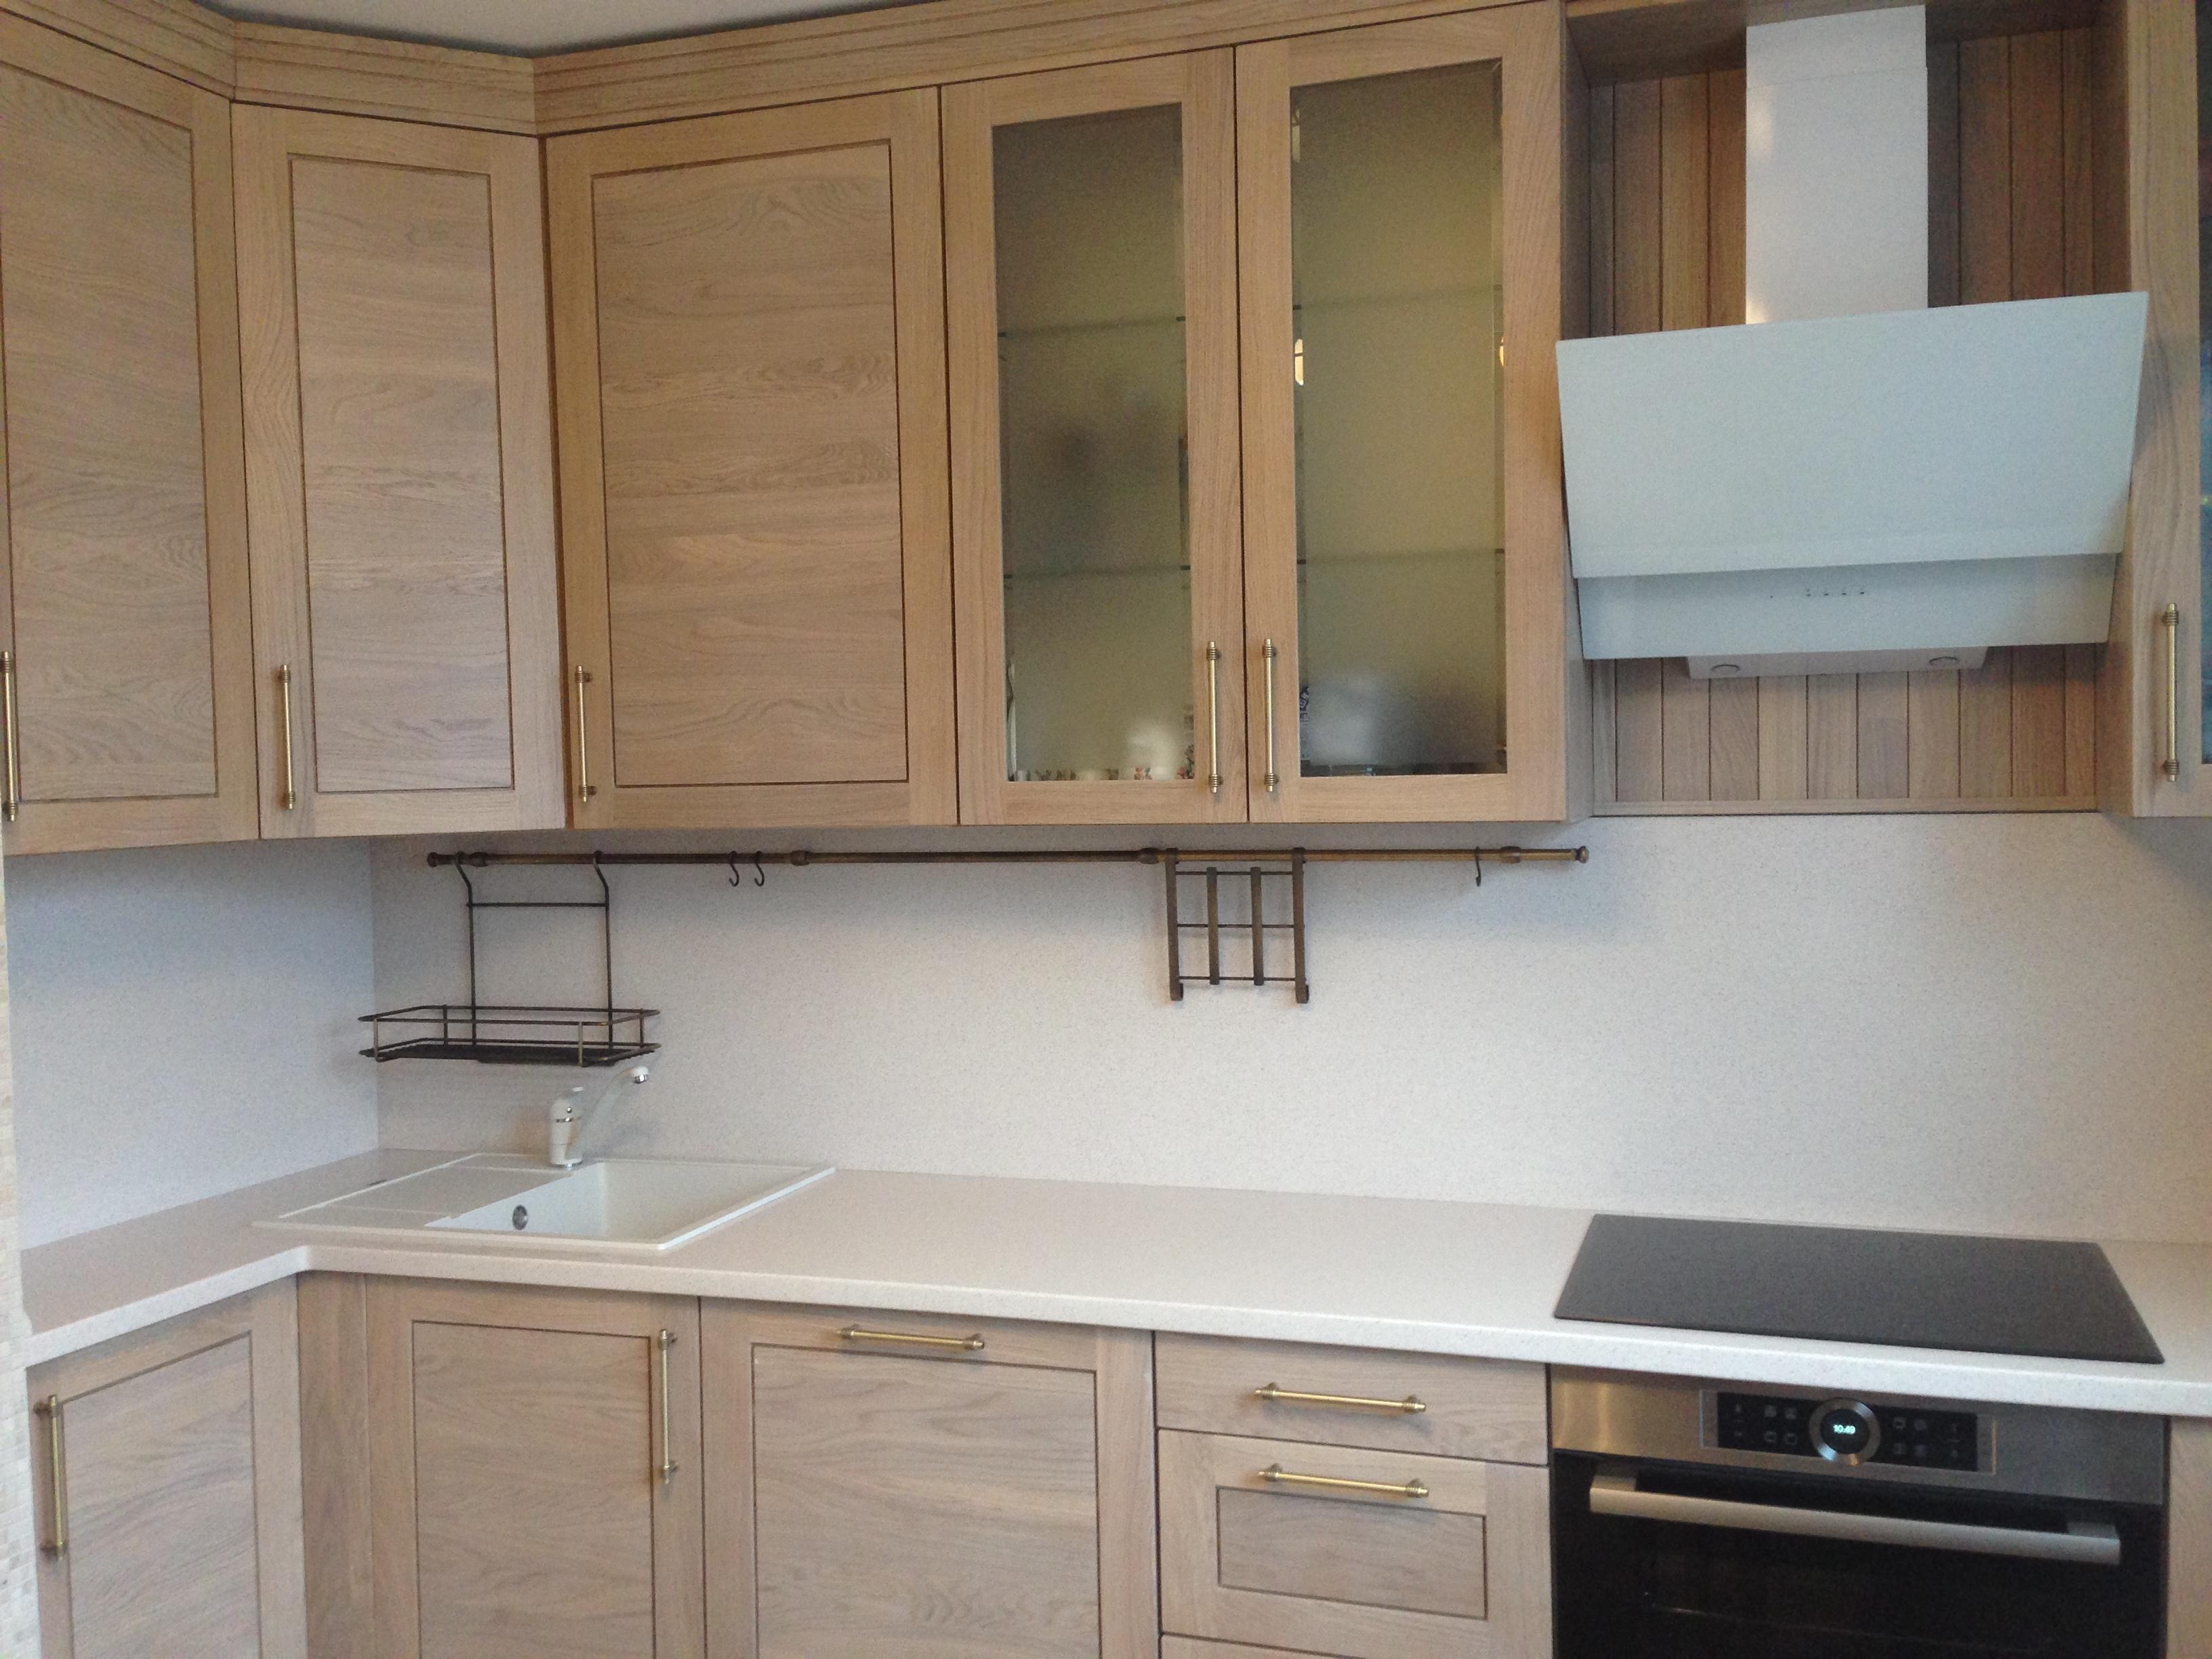 Кухонная столешница с «фартуком» из камня